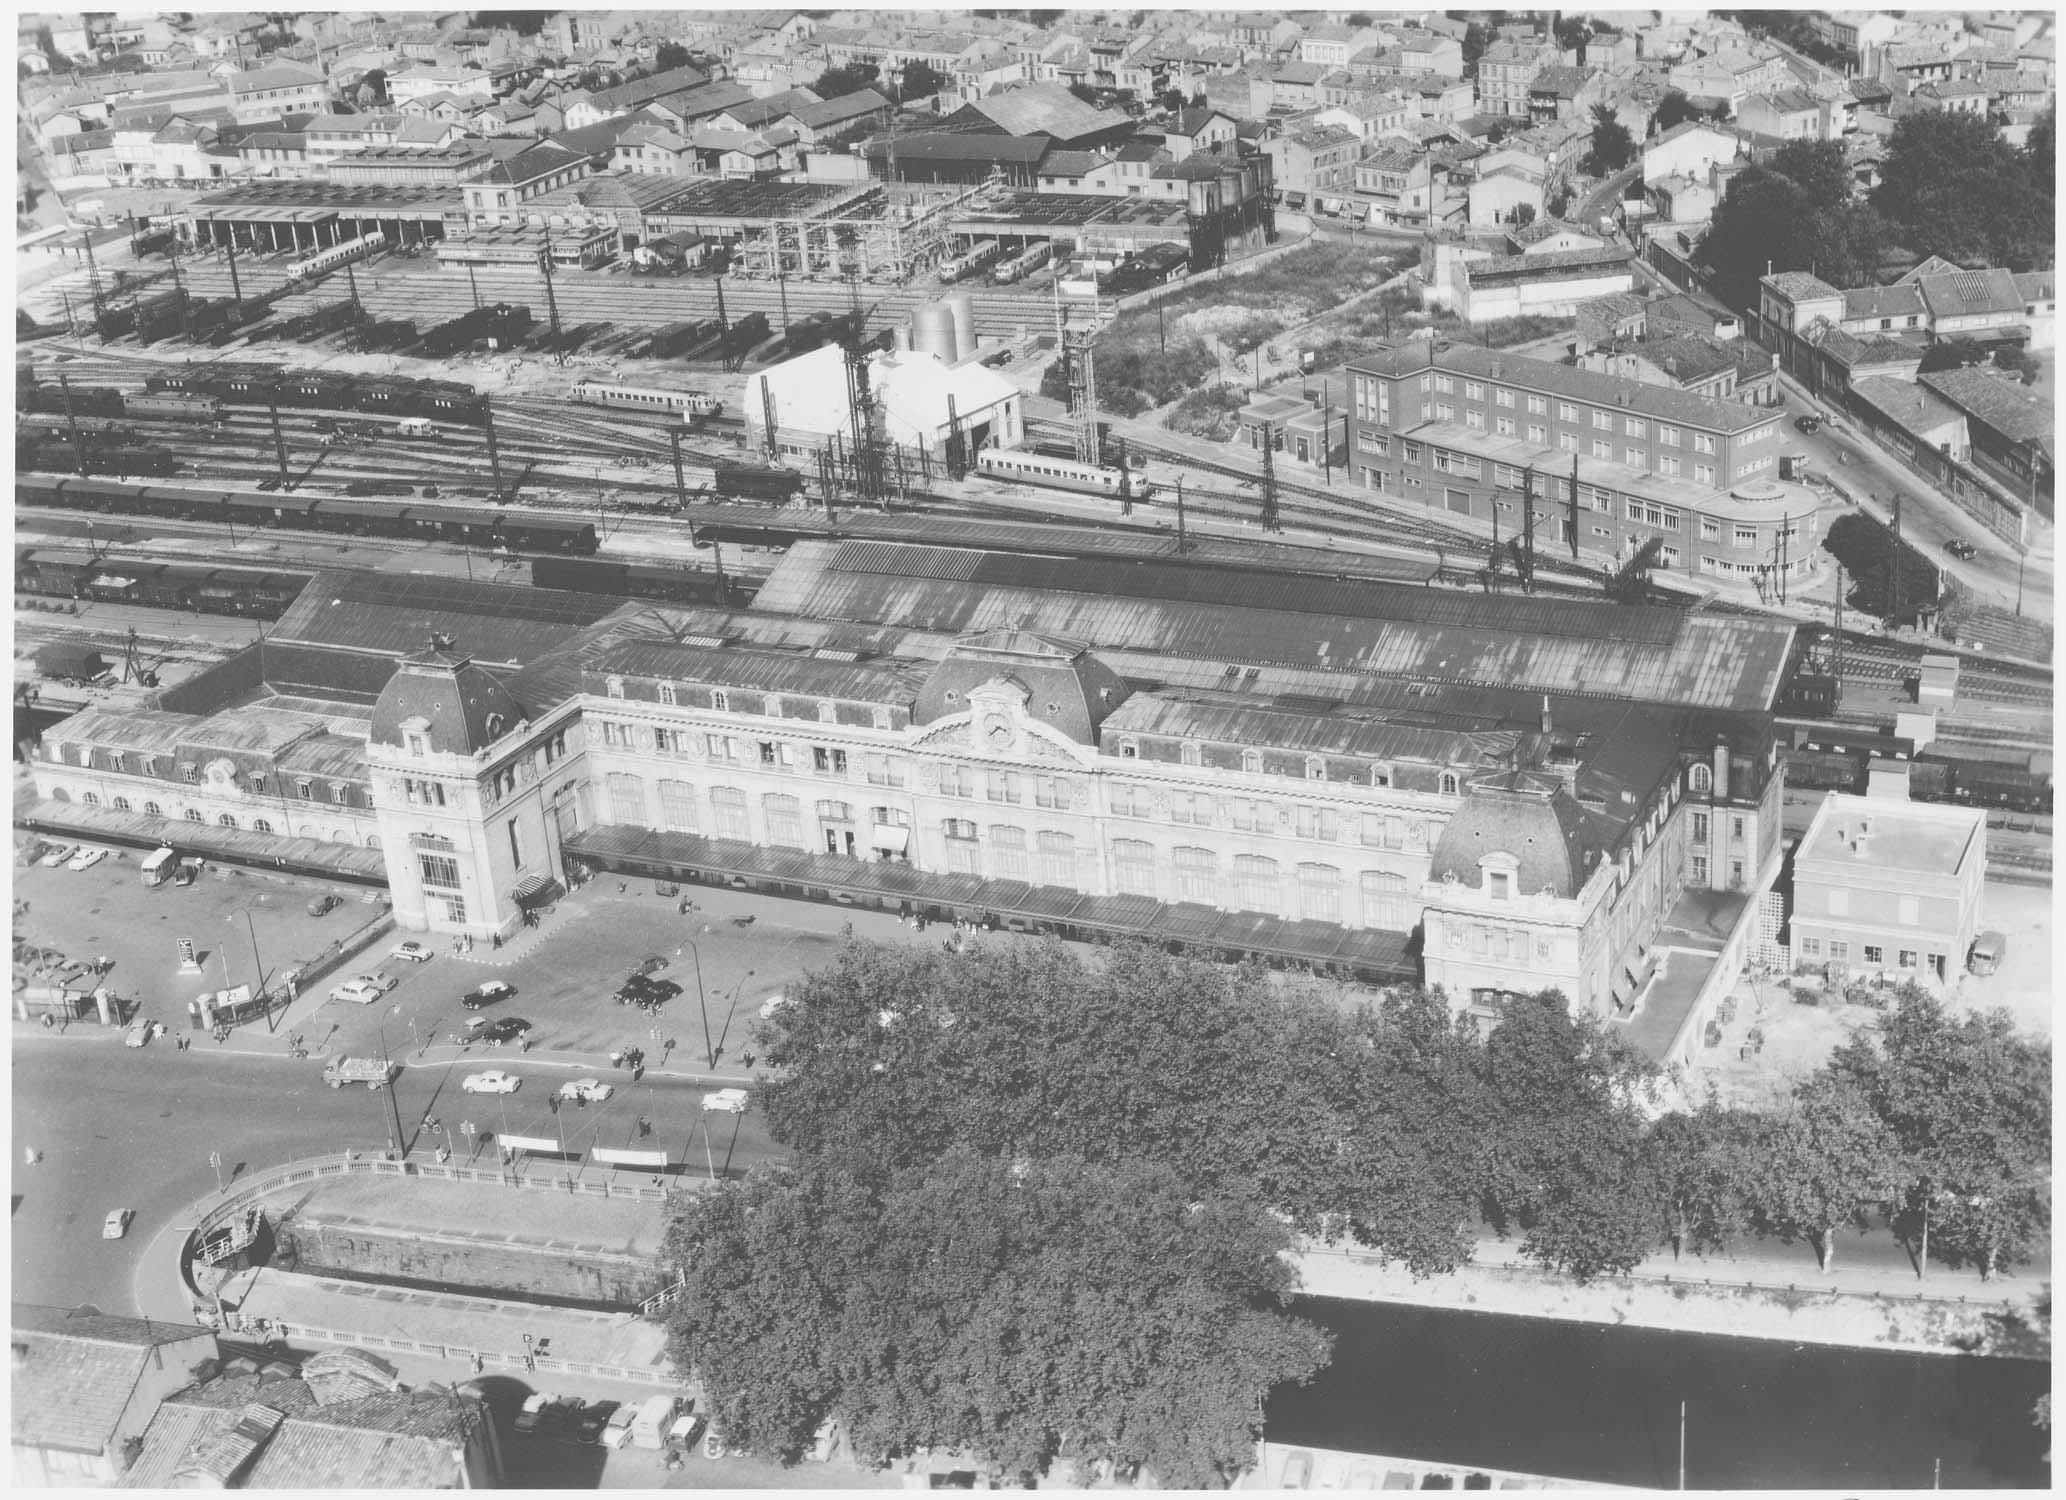 Gare de Matabiau